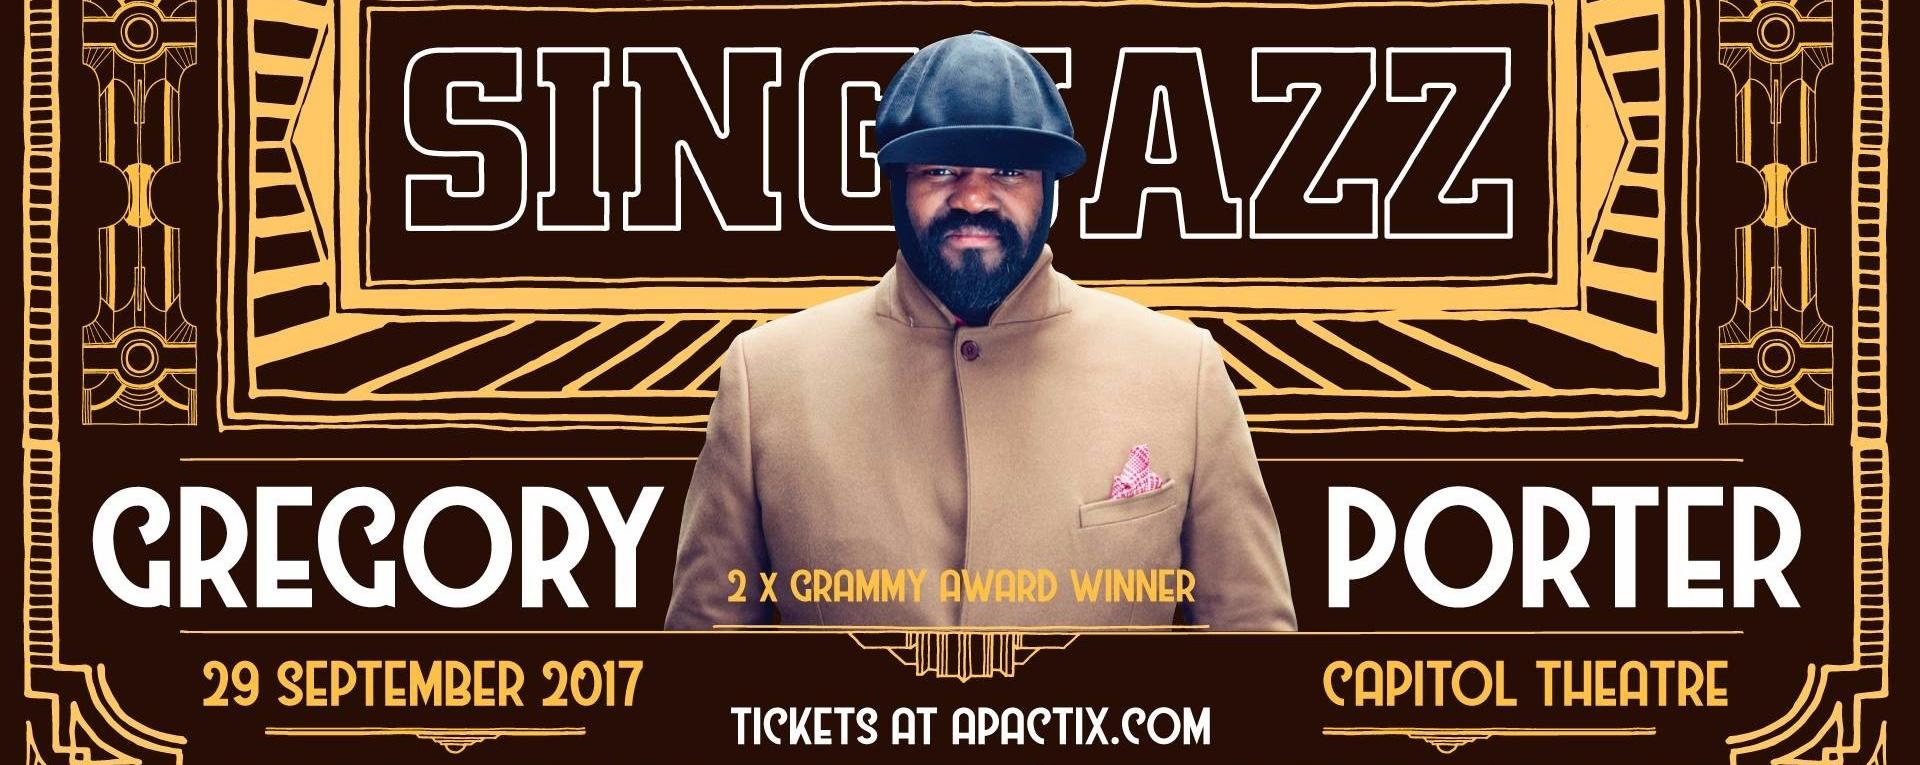 SING JAZZ Presents: Gregory Porter